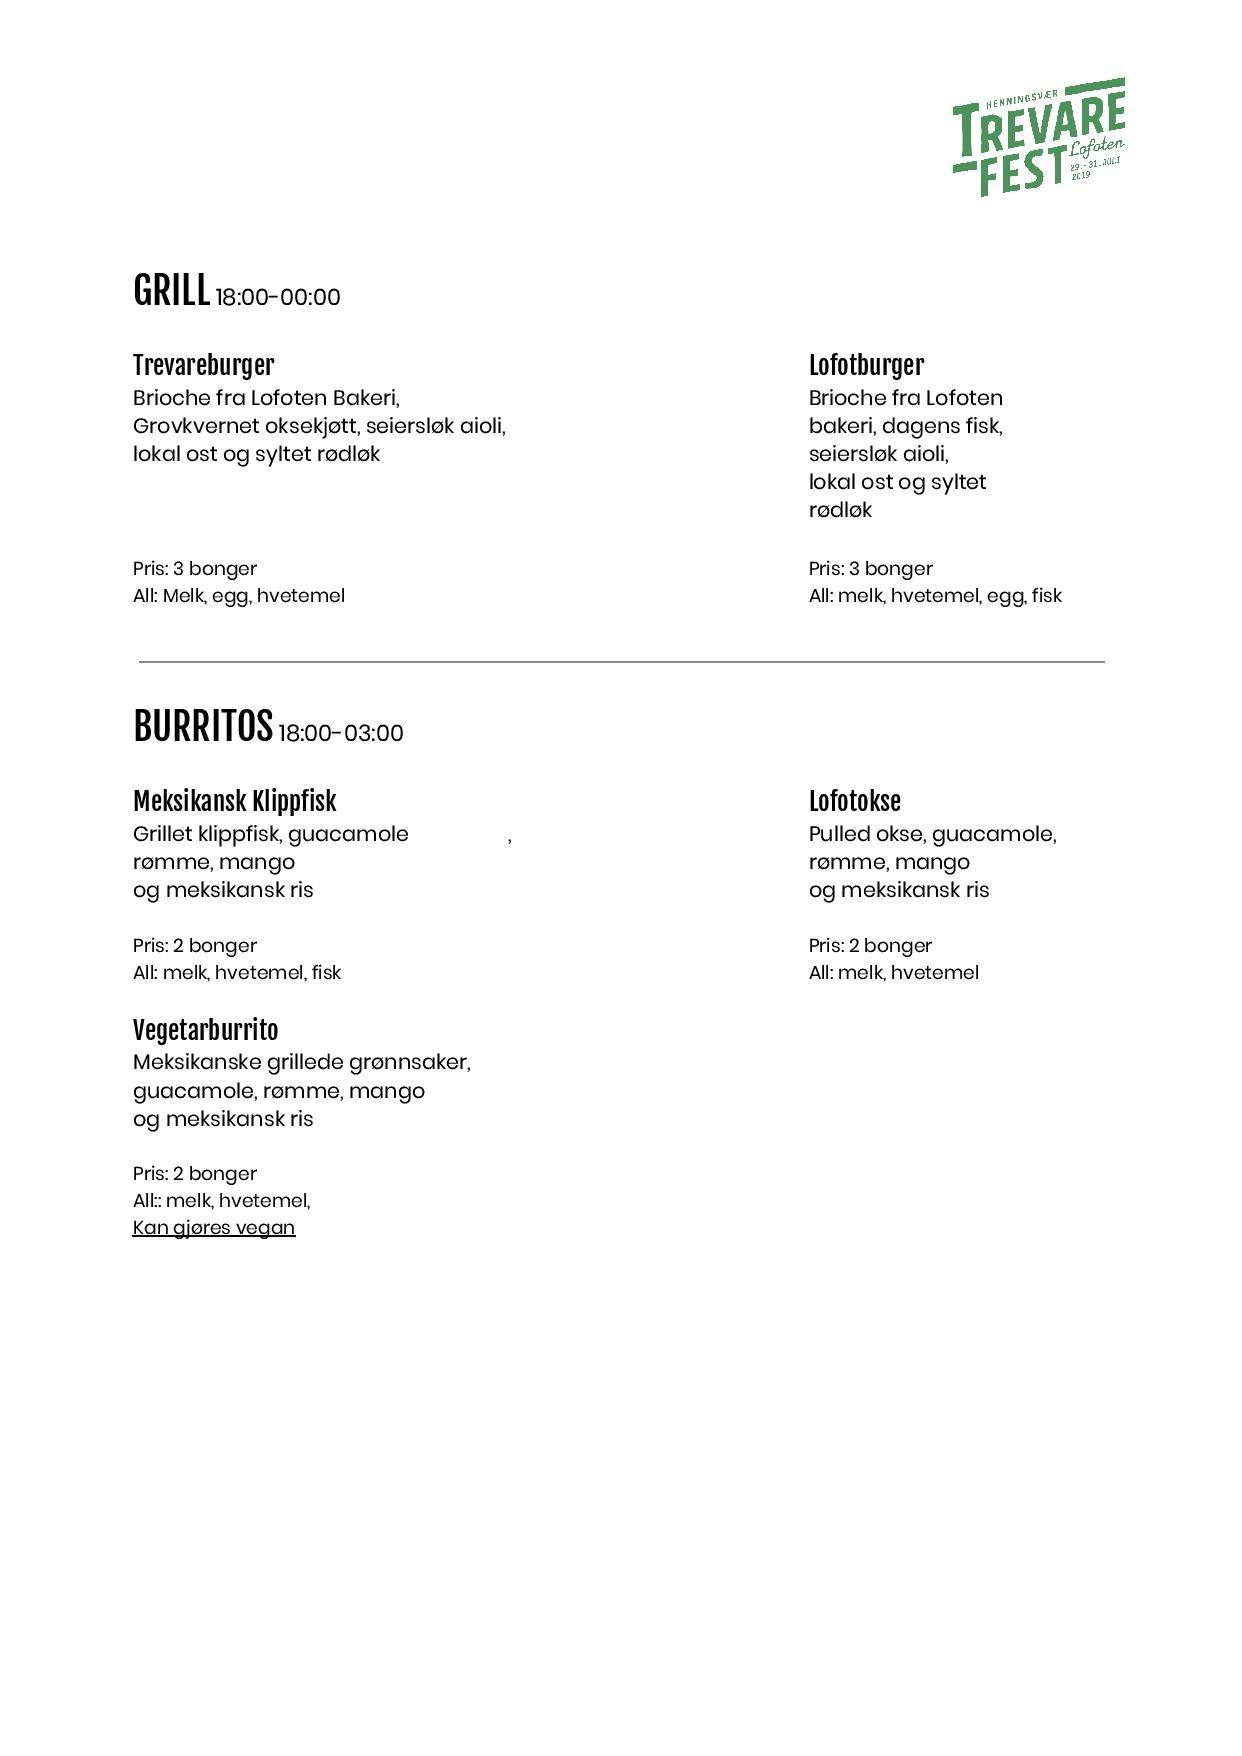 MATMENYTREVAREFEST2019 (1)-page-002.jpg